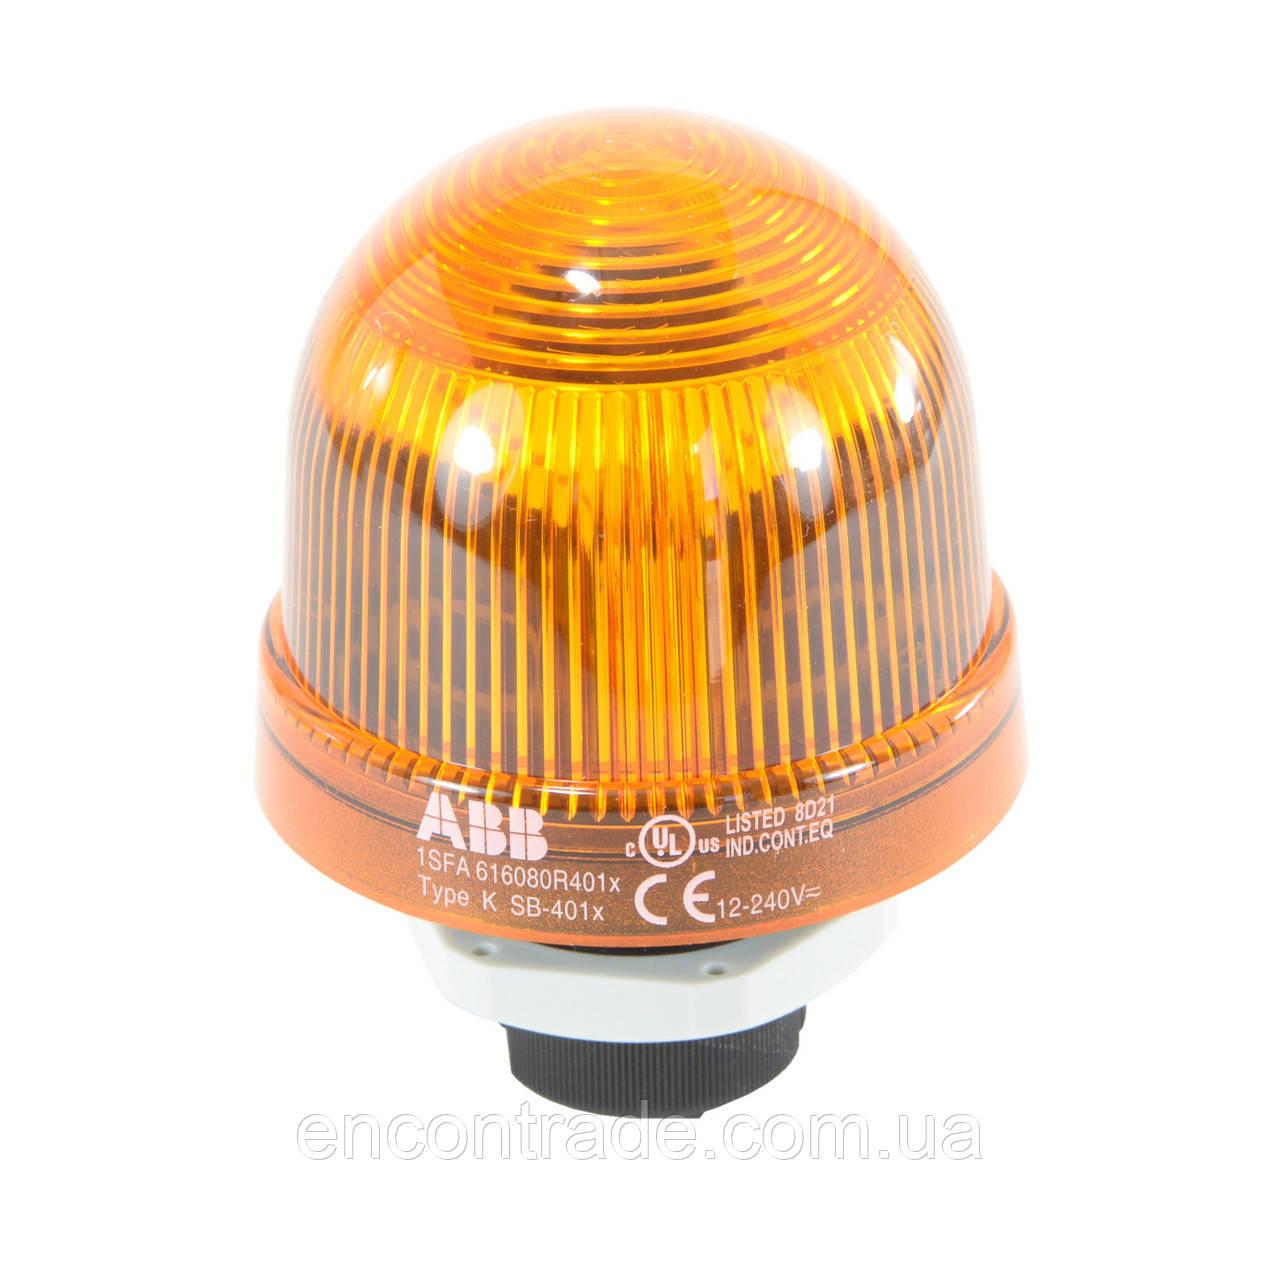 1SFA616080R4013 Сигнальный маяк  АВВ KSB-401Y